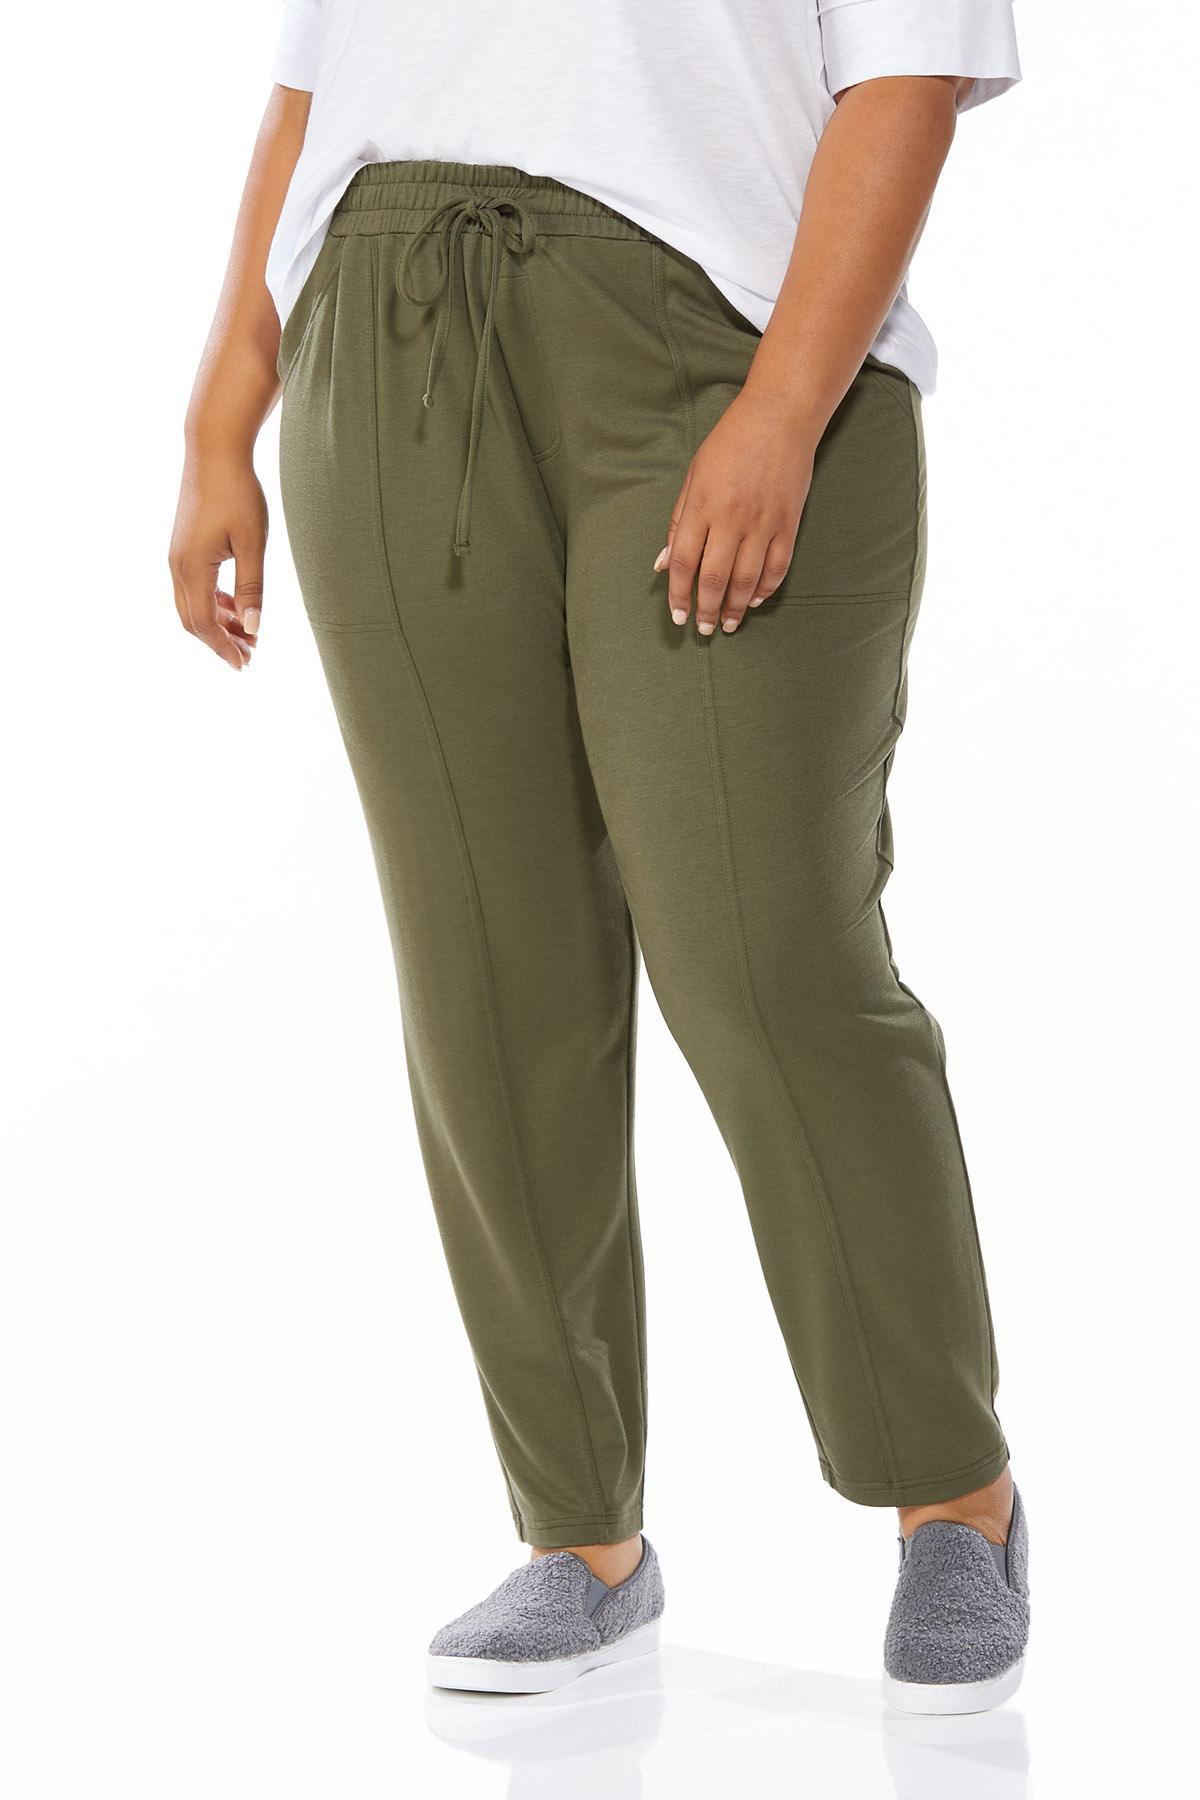 Plus Petite Soft Olive Pants